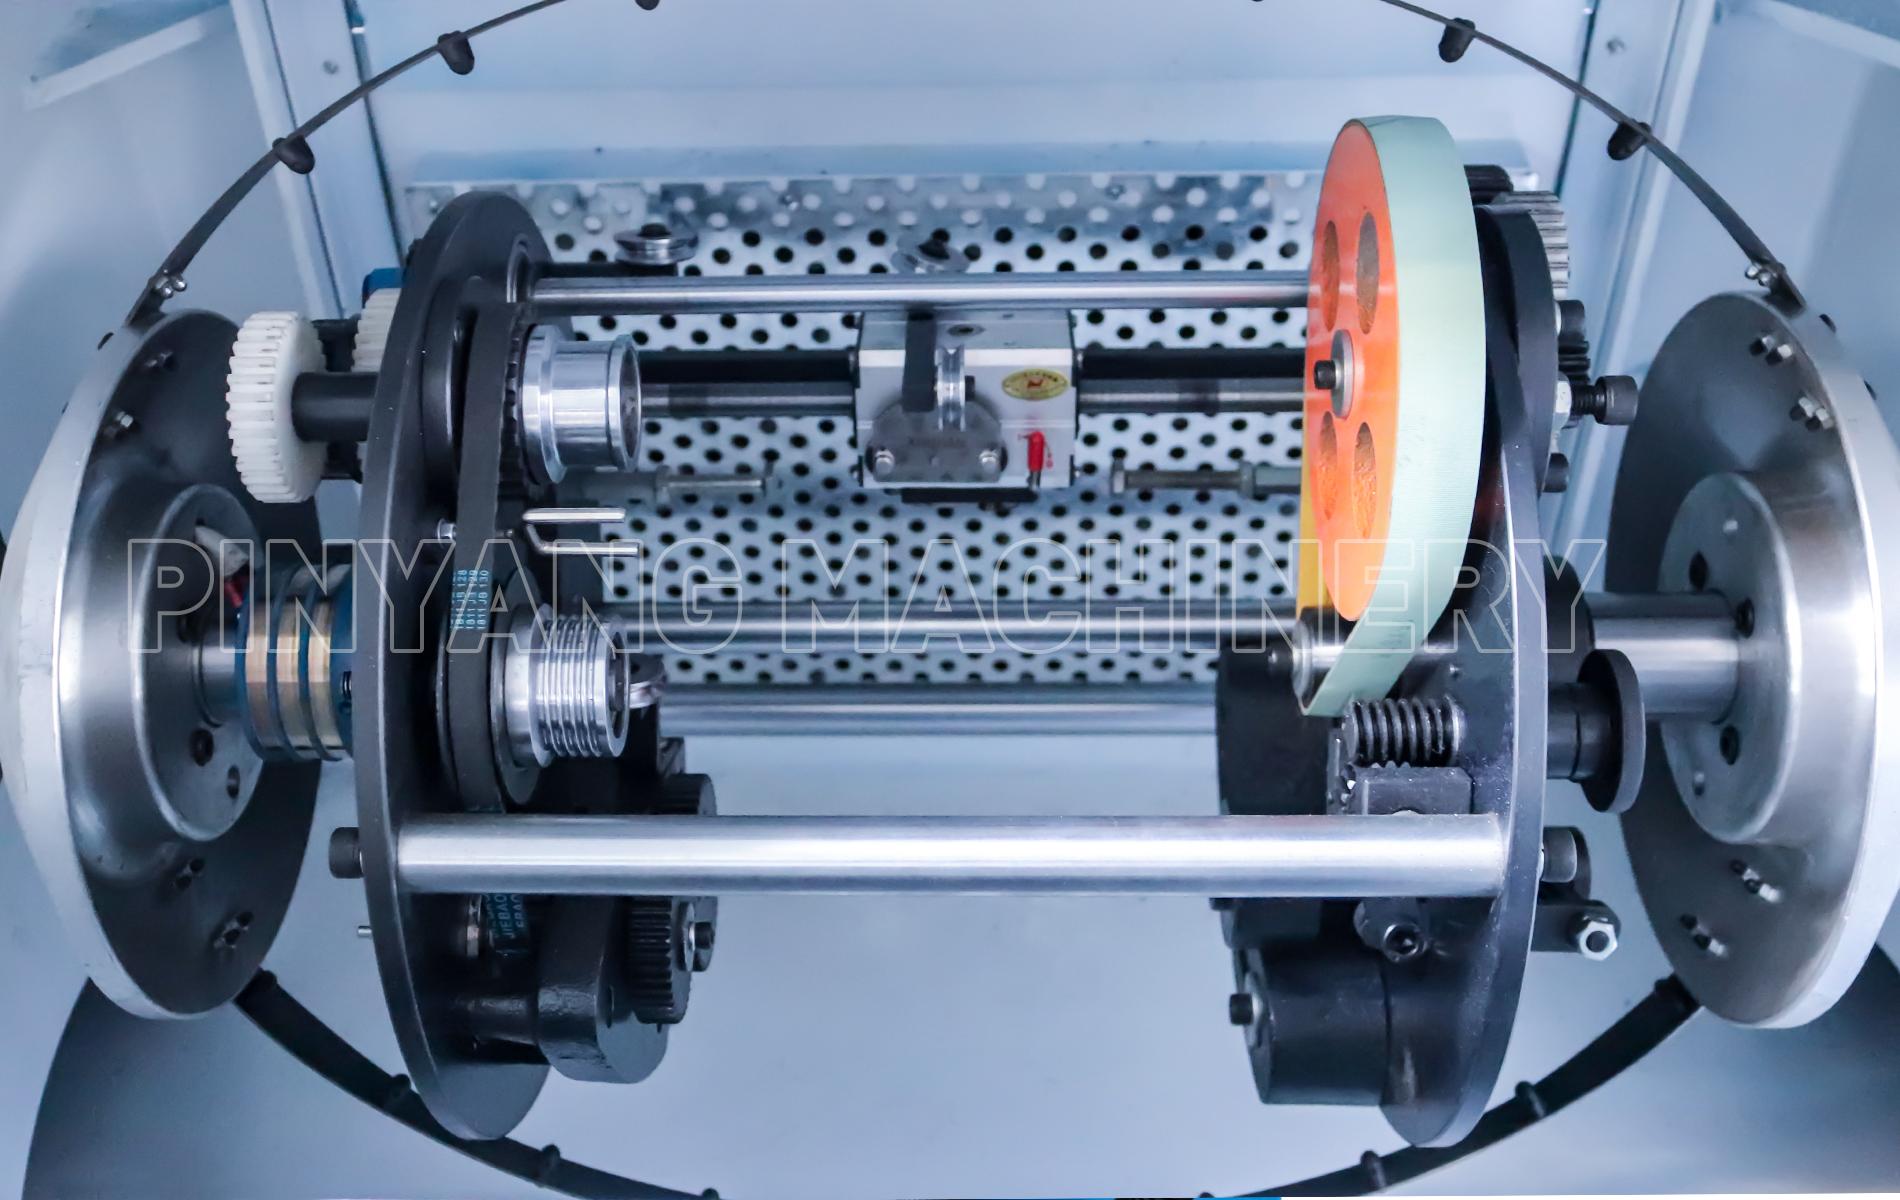 PY-630mm Auto High Speed Bunching Machine